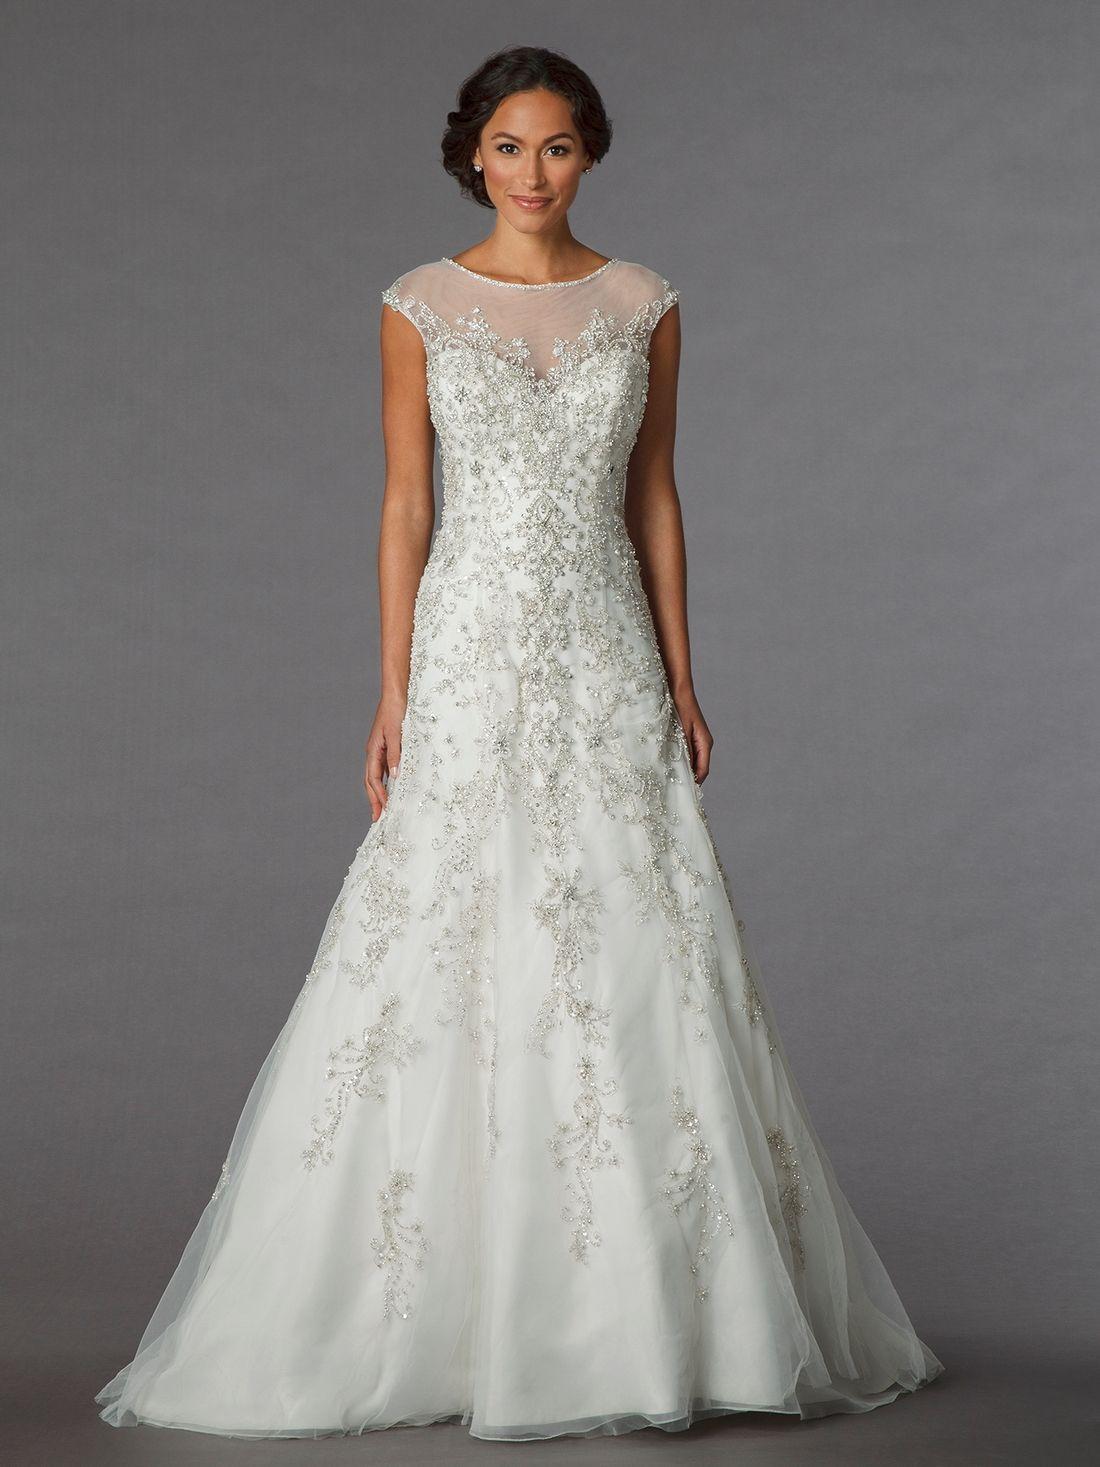 Sophia Moncelli Bridal Gown